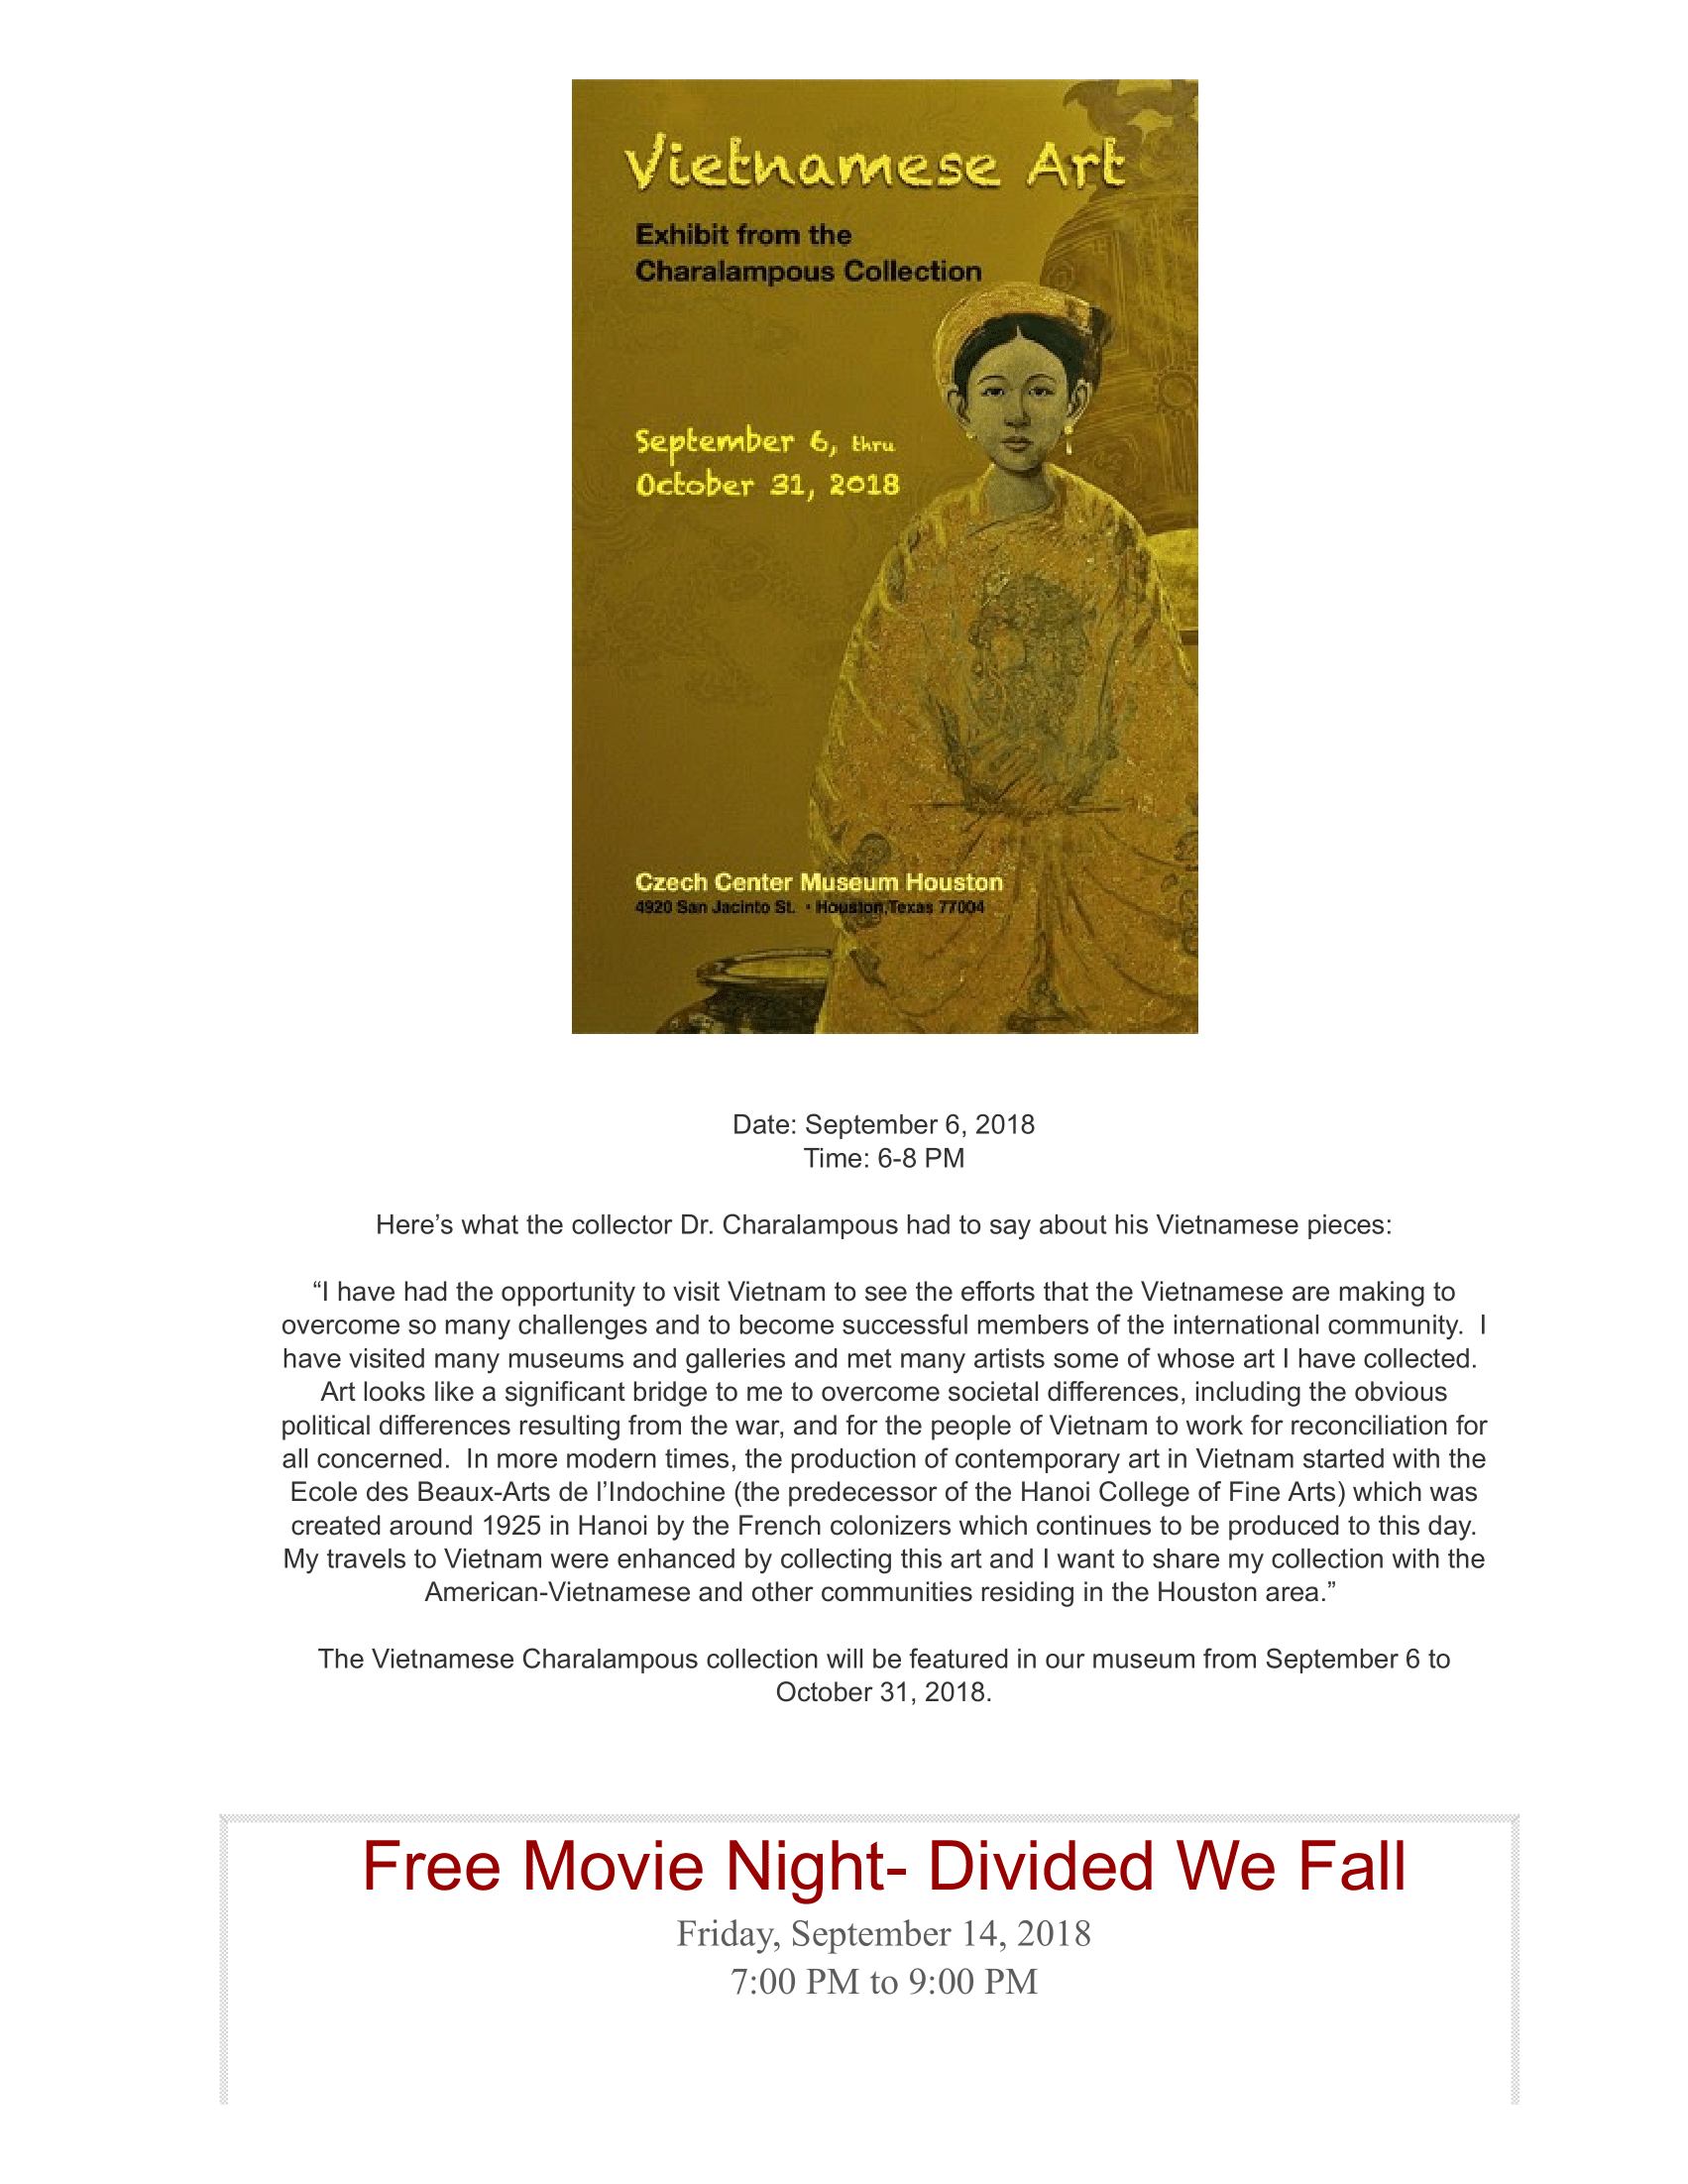 Czech Center Museum Houston Mail - CCMH august-september Newsletter-4.png